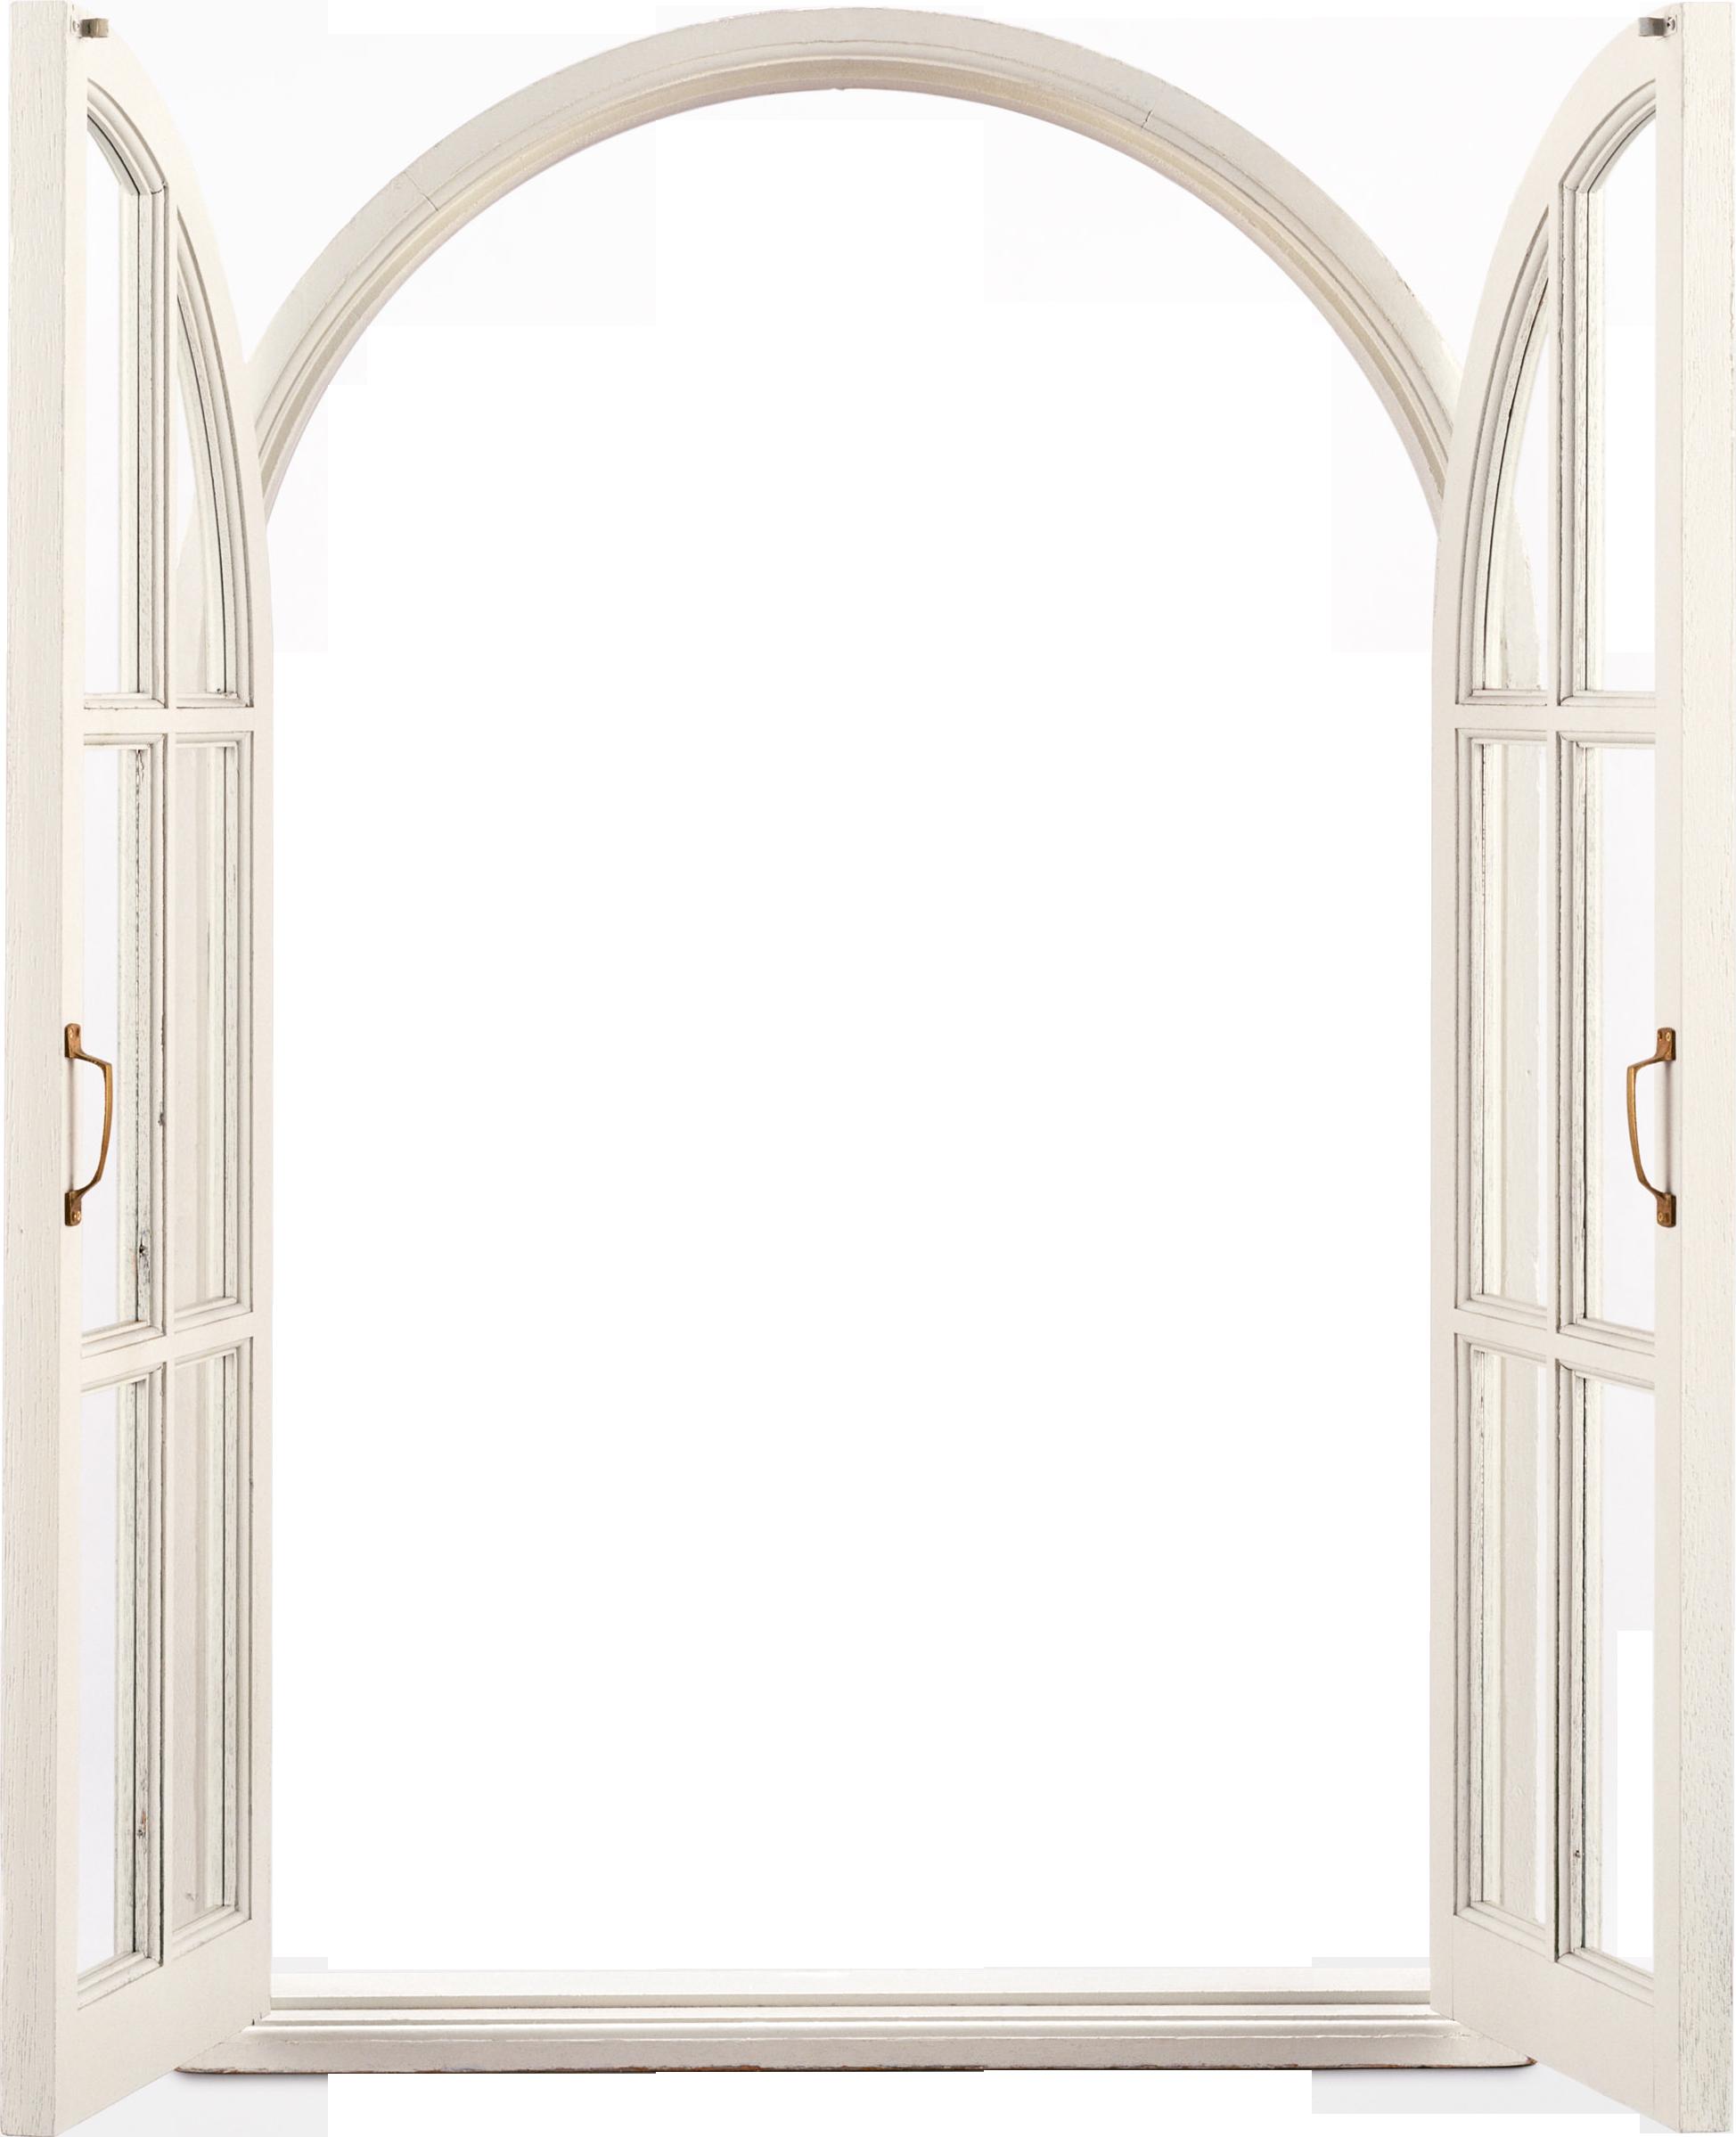 Деревянное окно картинка